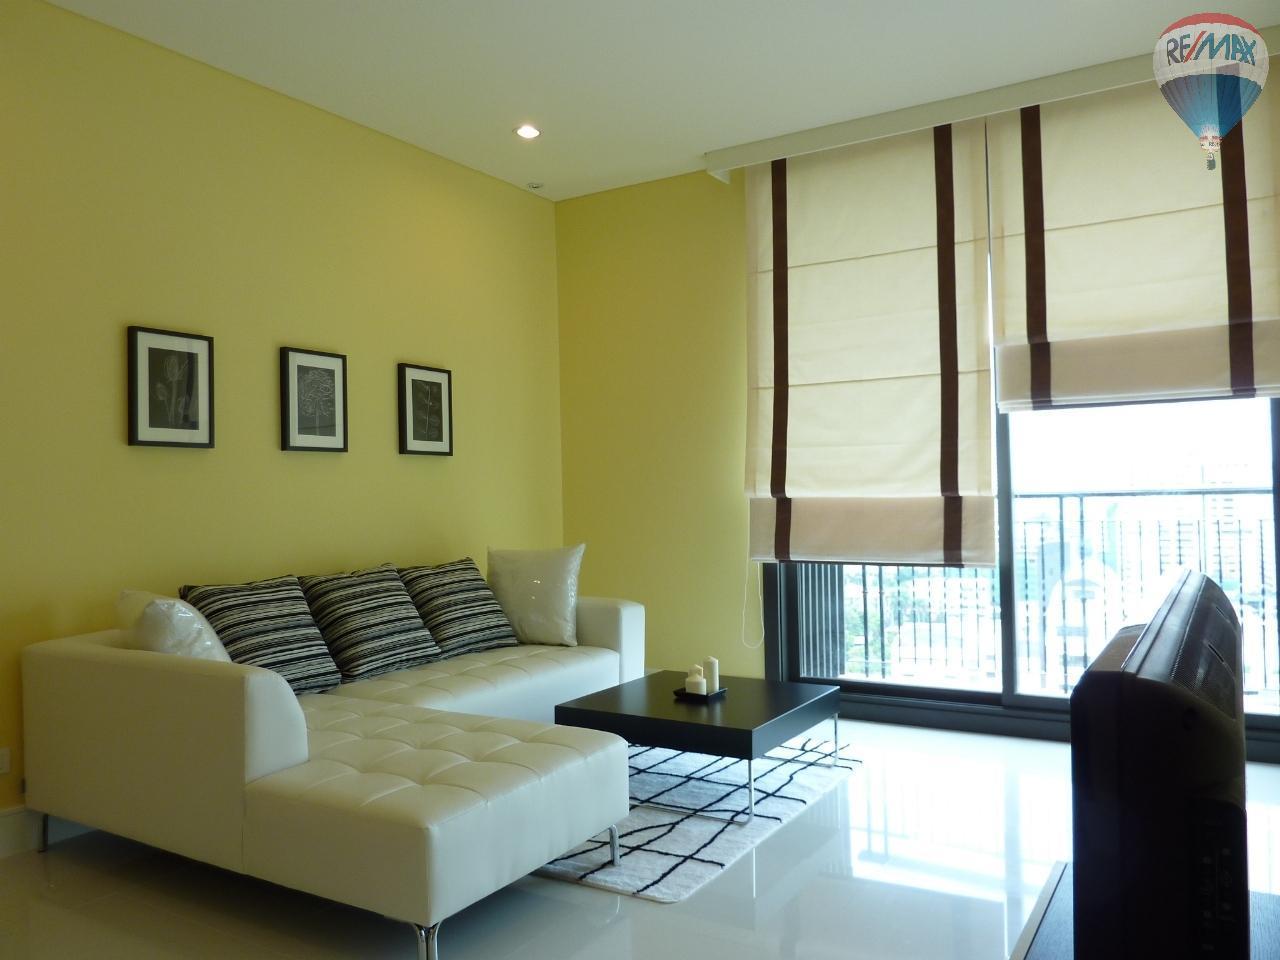 RE/MAX Properties Agency's Aguston 22, BTS Phrom Phong, 1B/1B, pet-friendly condo 2